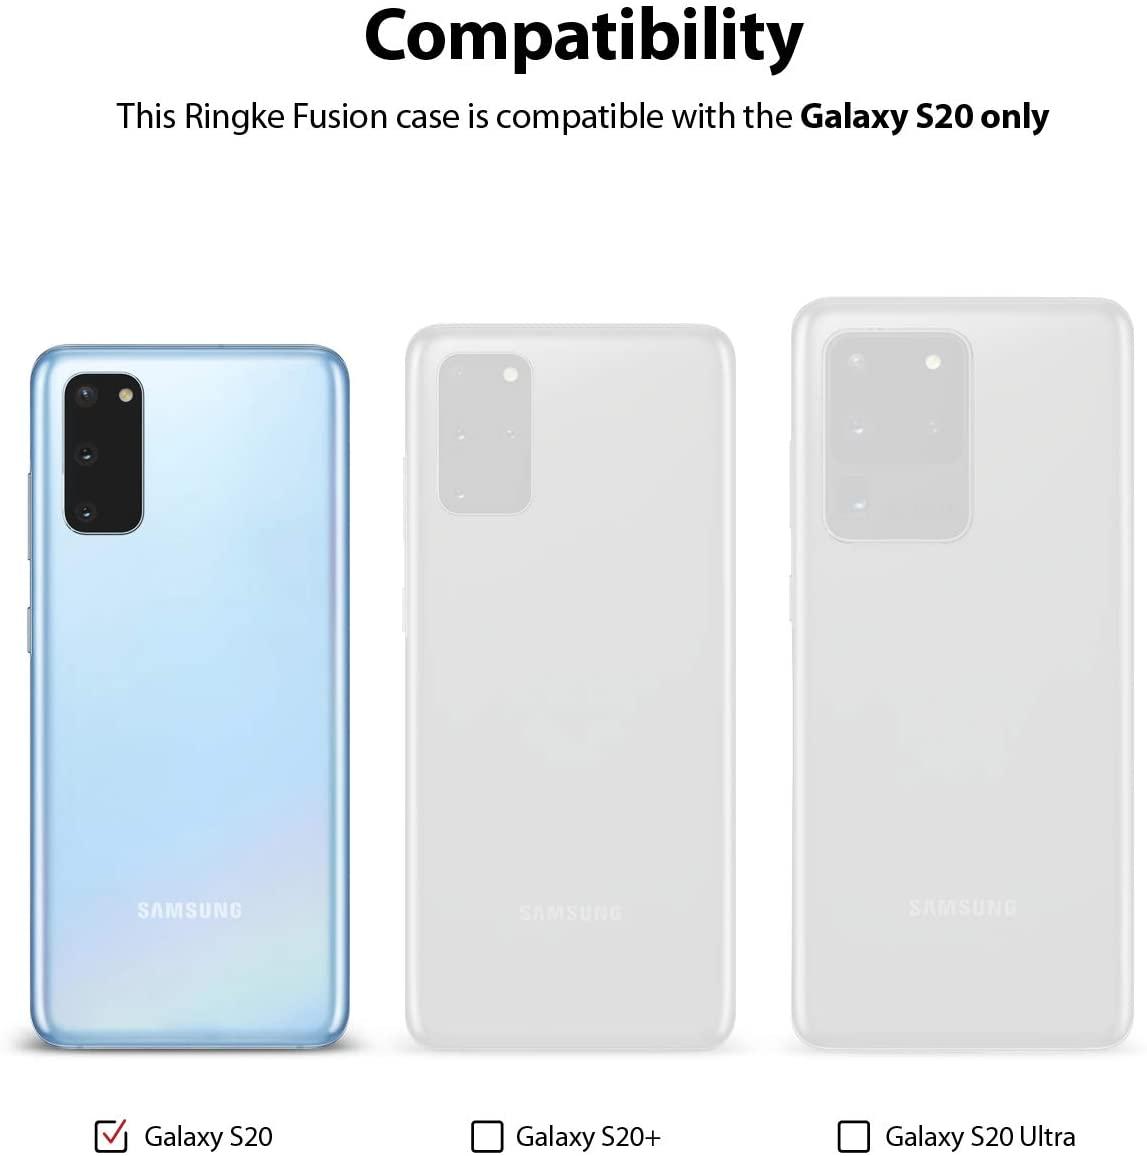 Capa Ringke Fusion - Samsung Galaxy S20 (Tela 6.2)